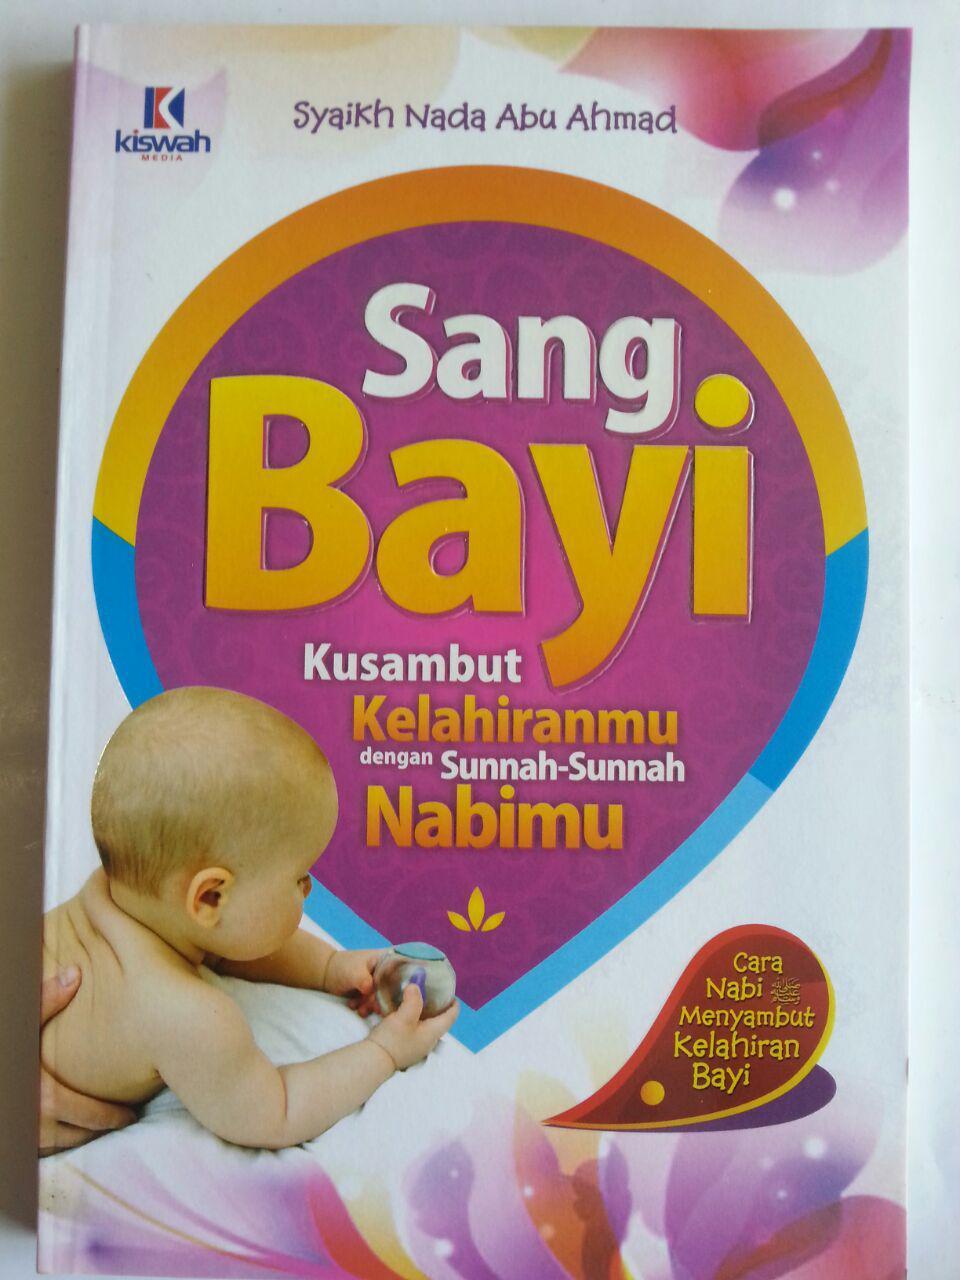 Buku Sang Bayi Kusambut Kelahiranmu Dengan Sunnah Nabimu cover 2